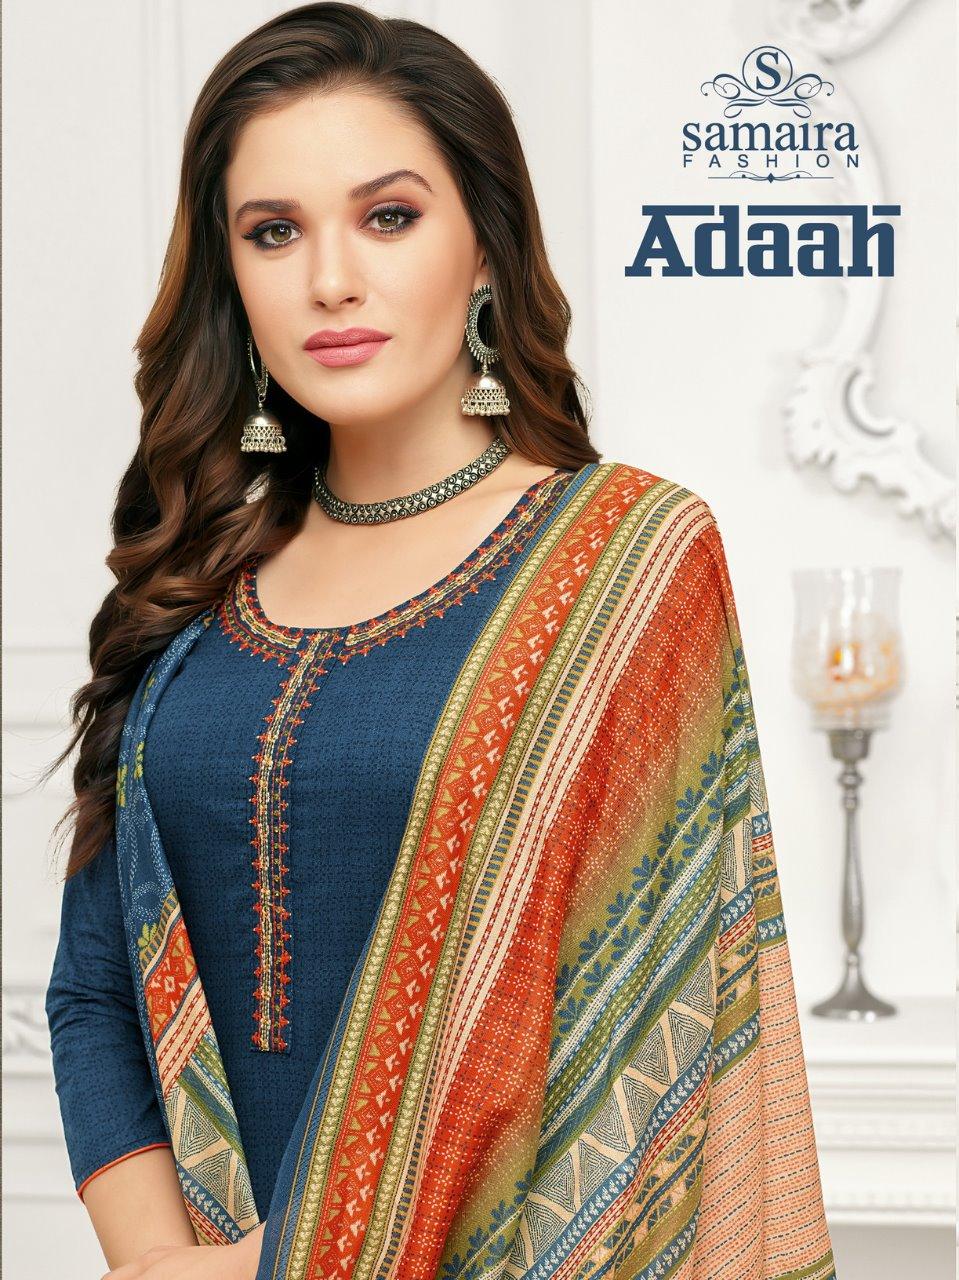 Samaira Fashion Adaah Pure Camric Cotton Digital Print Salwar Suit Supplier